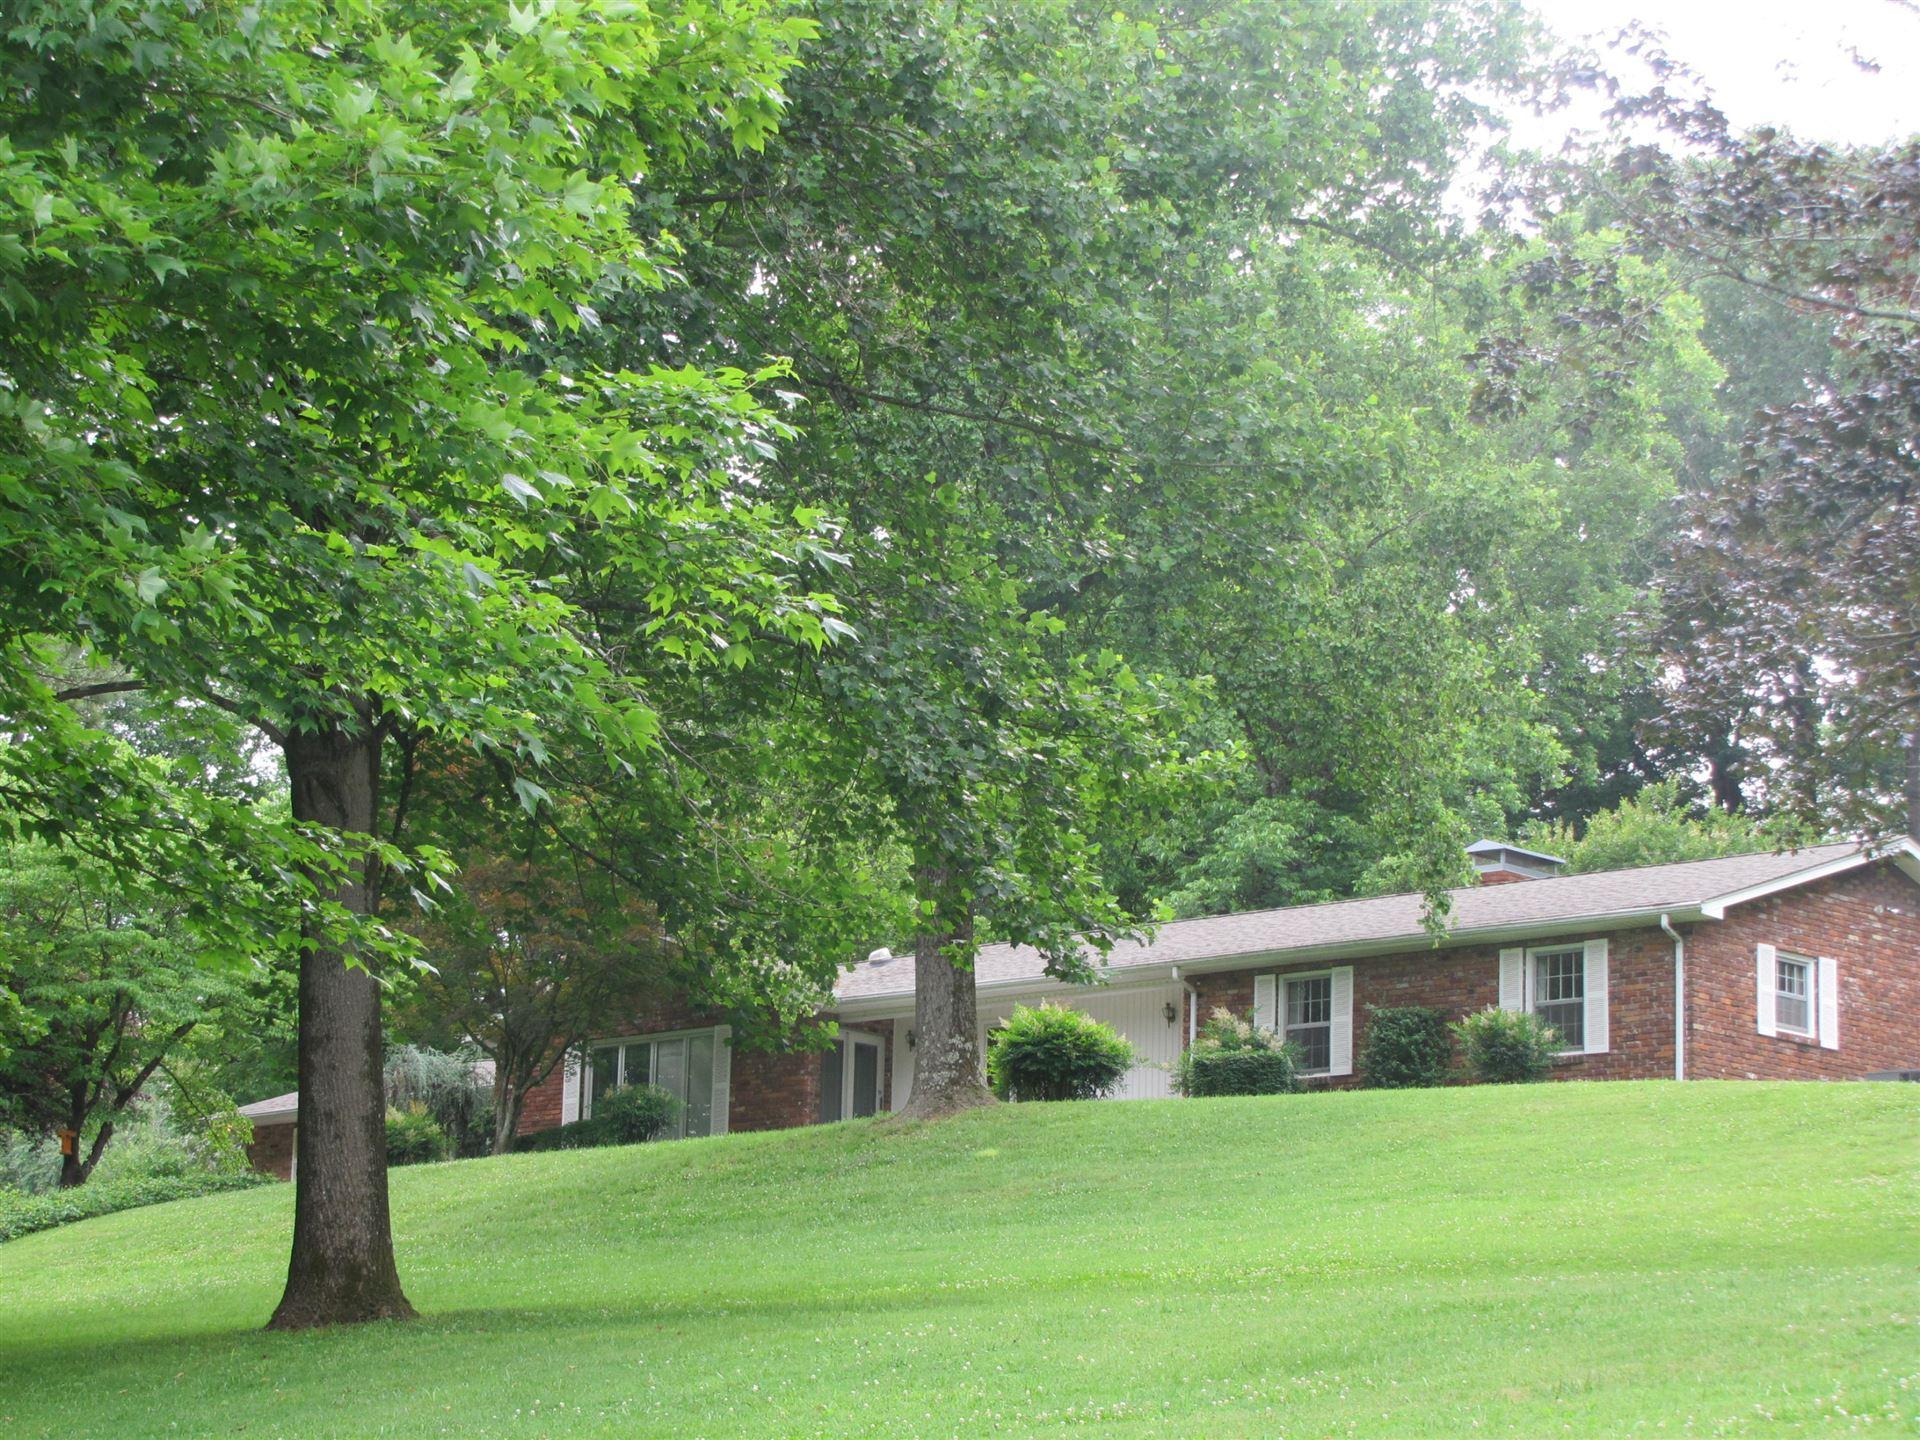 Photo of 2151 Mountain View Road Rd, Lenoir City, TN 37771 (MLS # 1119519)